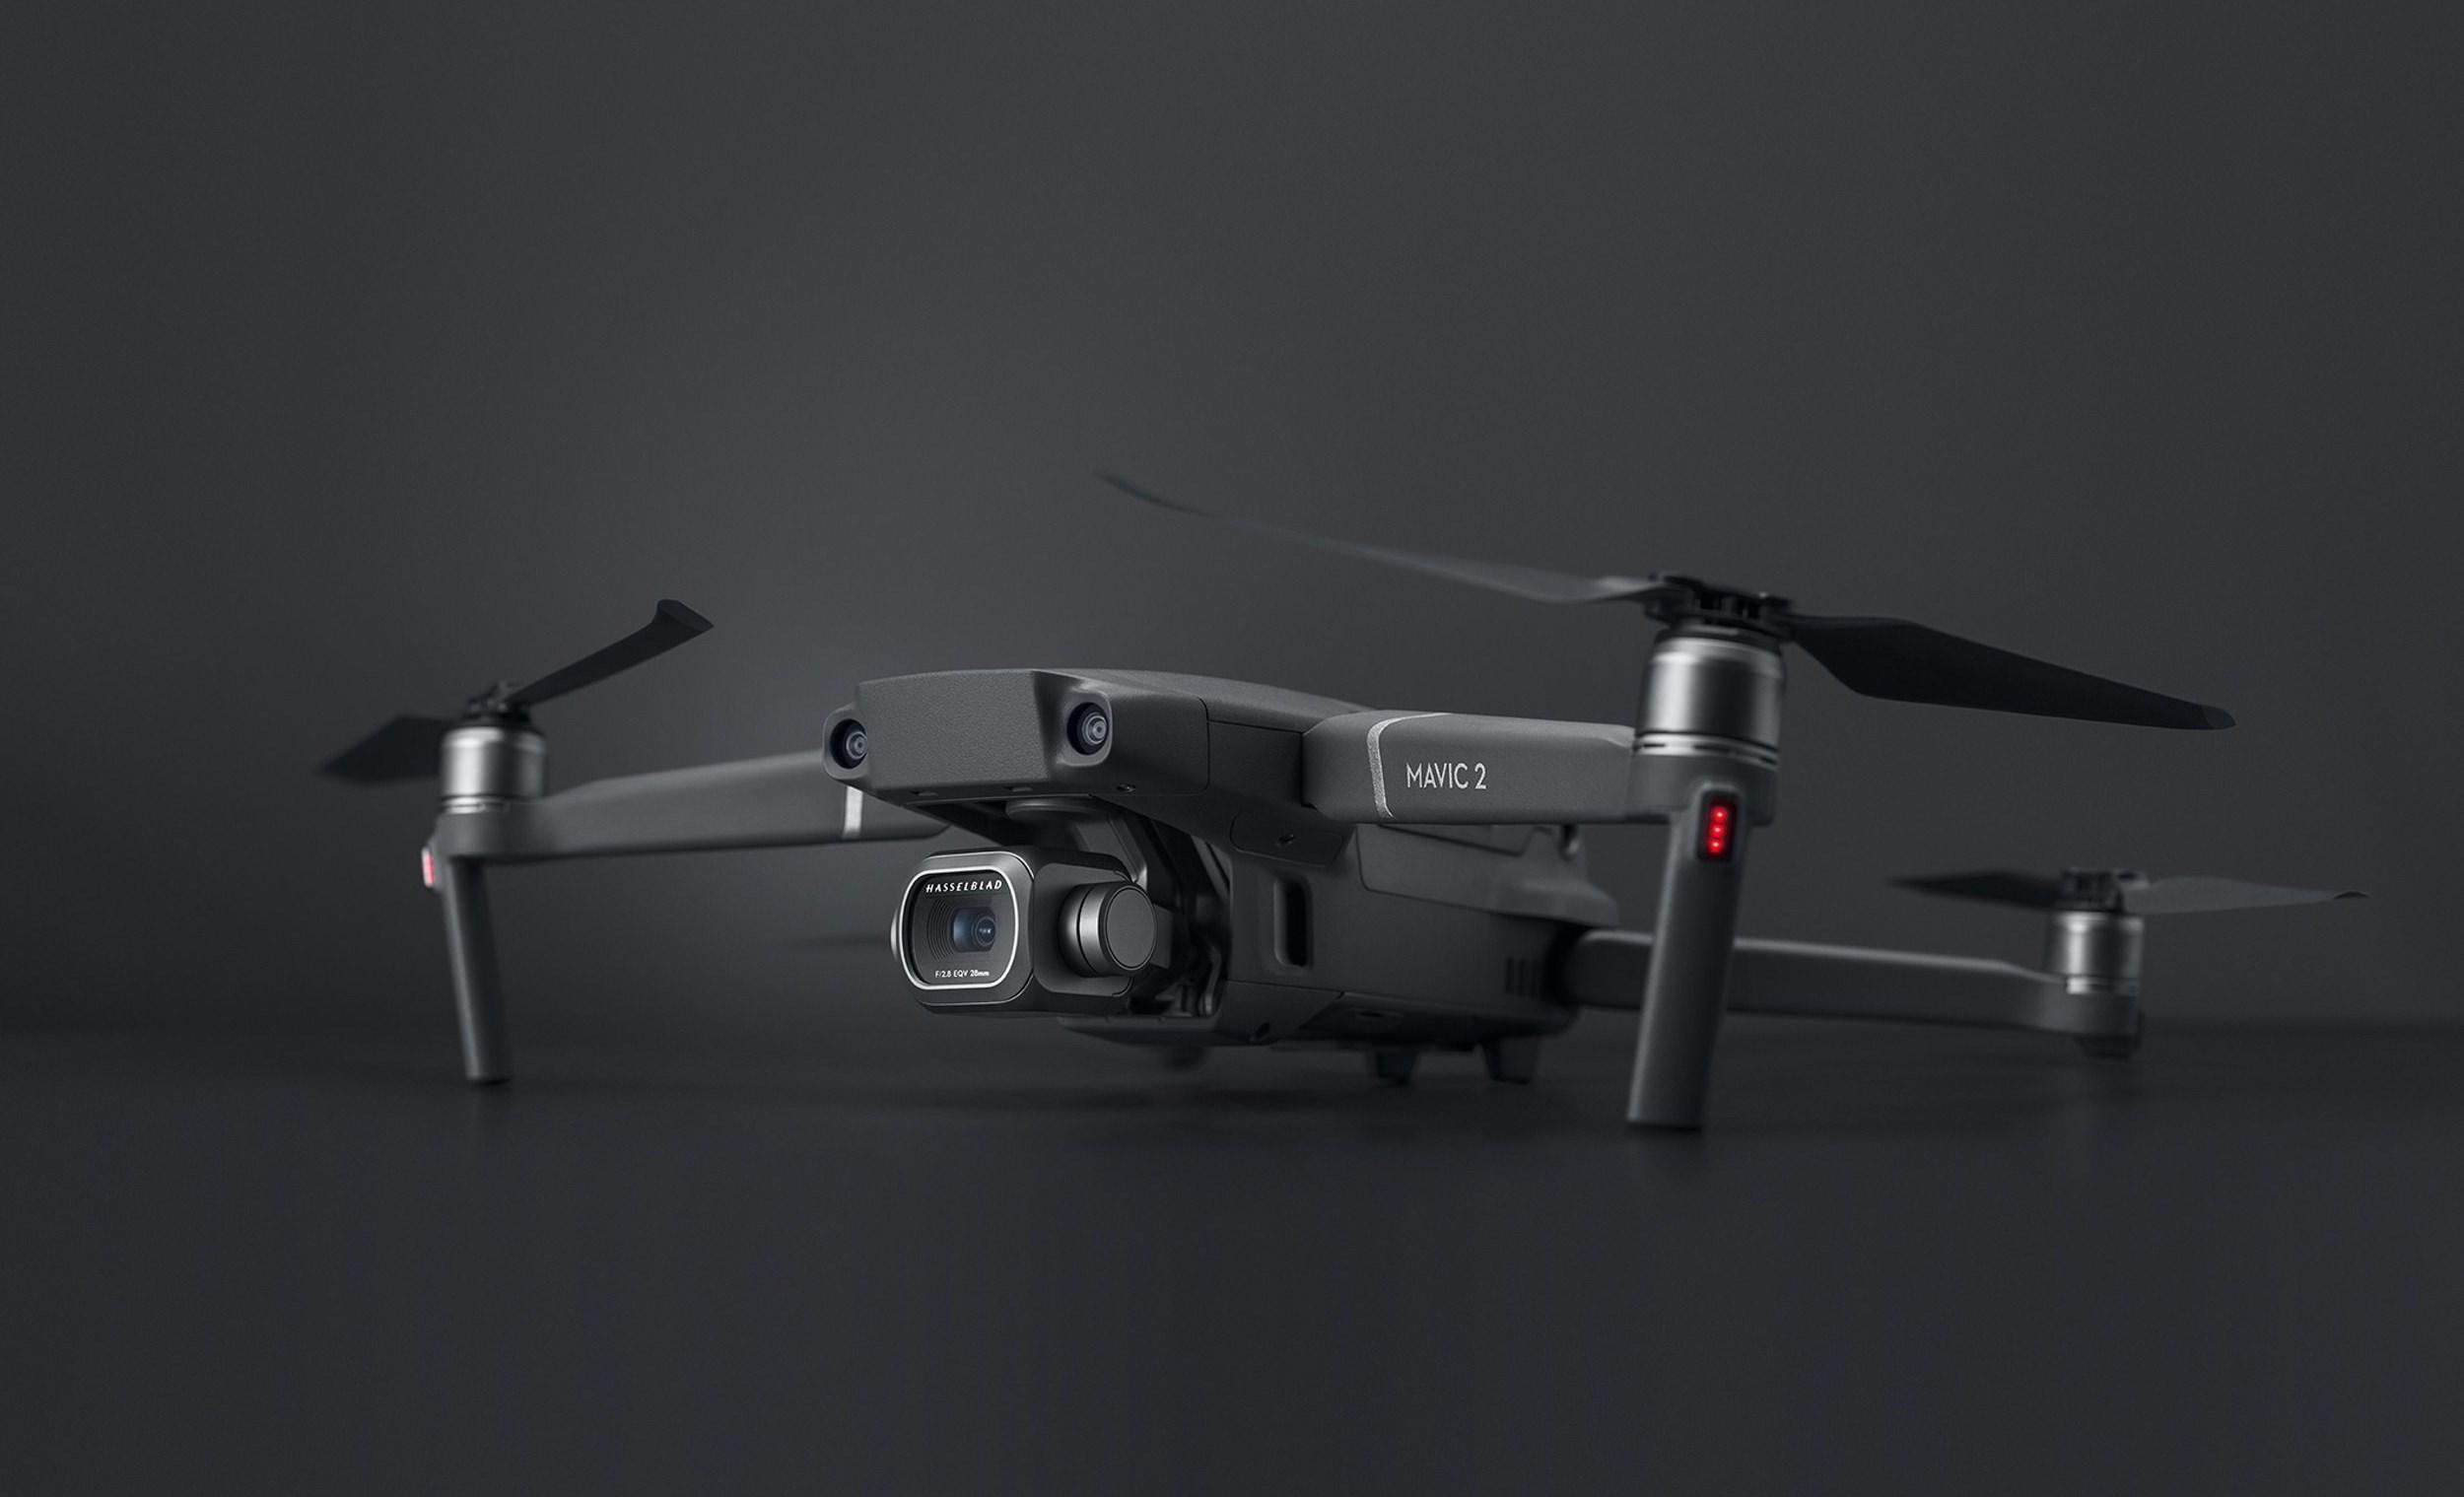 Rent the DJI Mavic 2 Pro drone for cheap in Berlin Germany